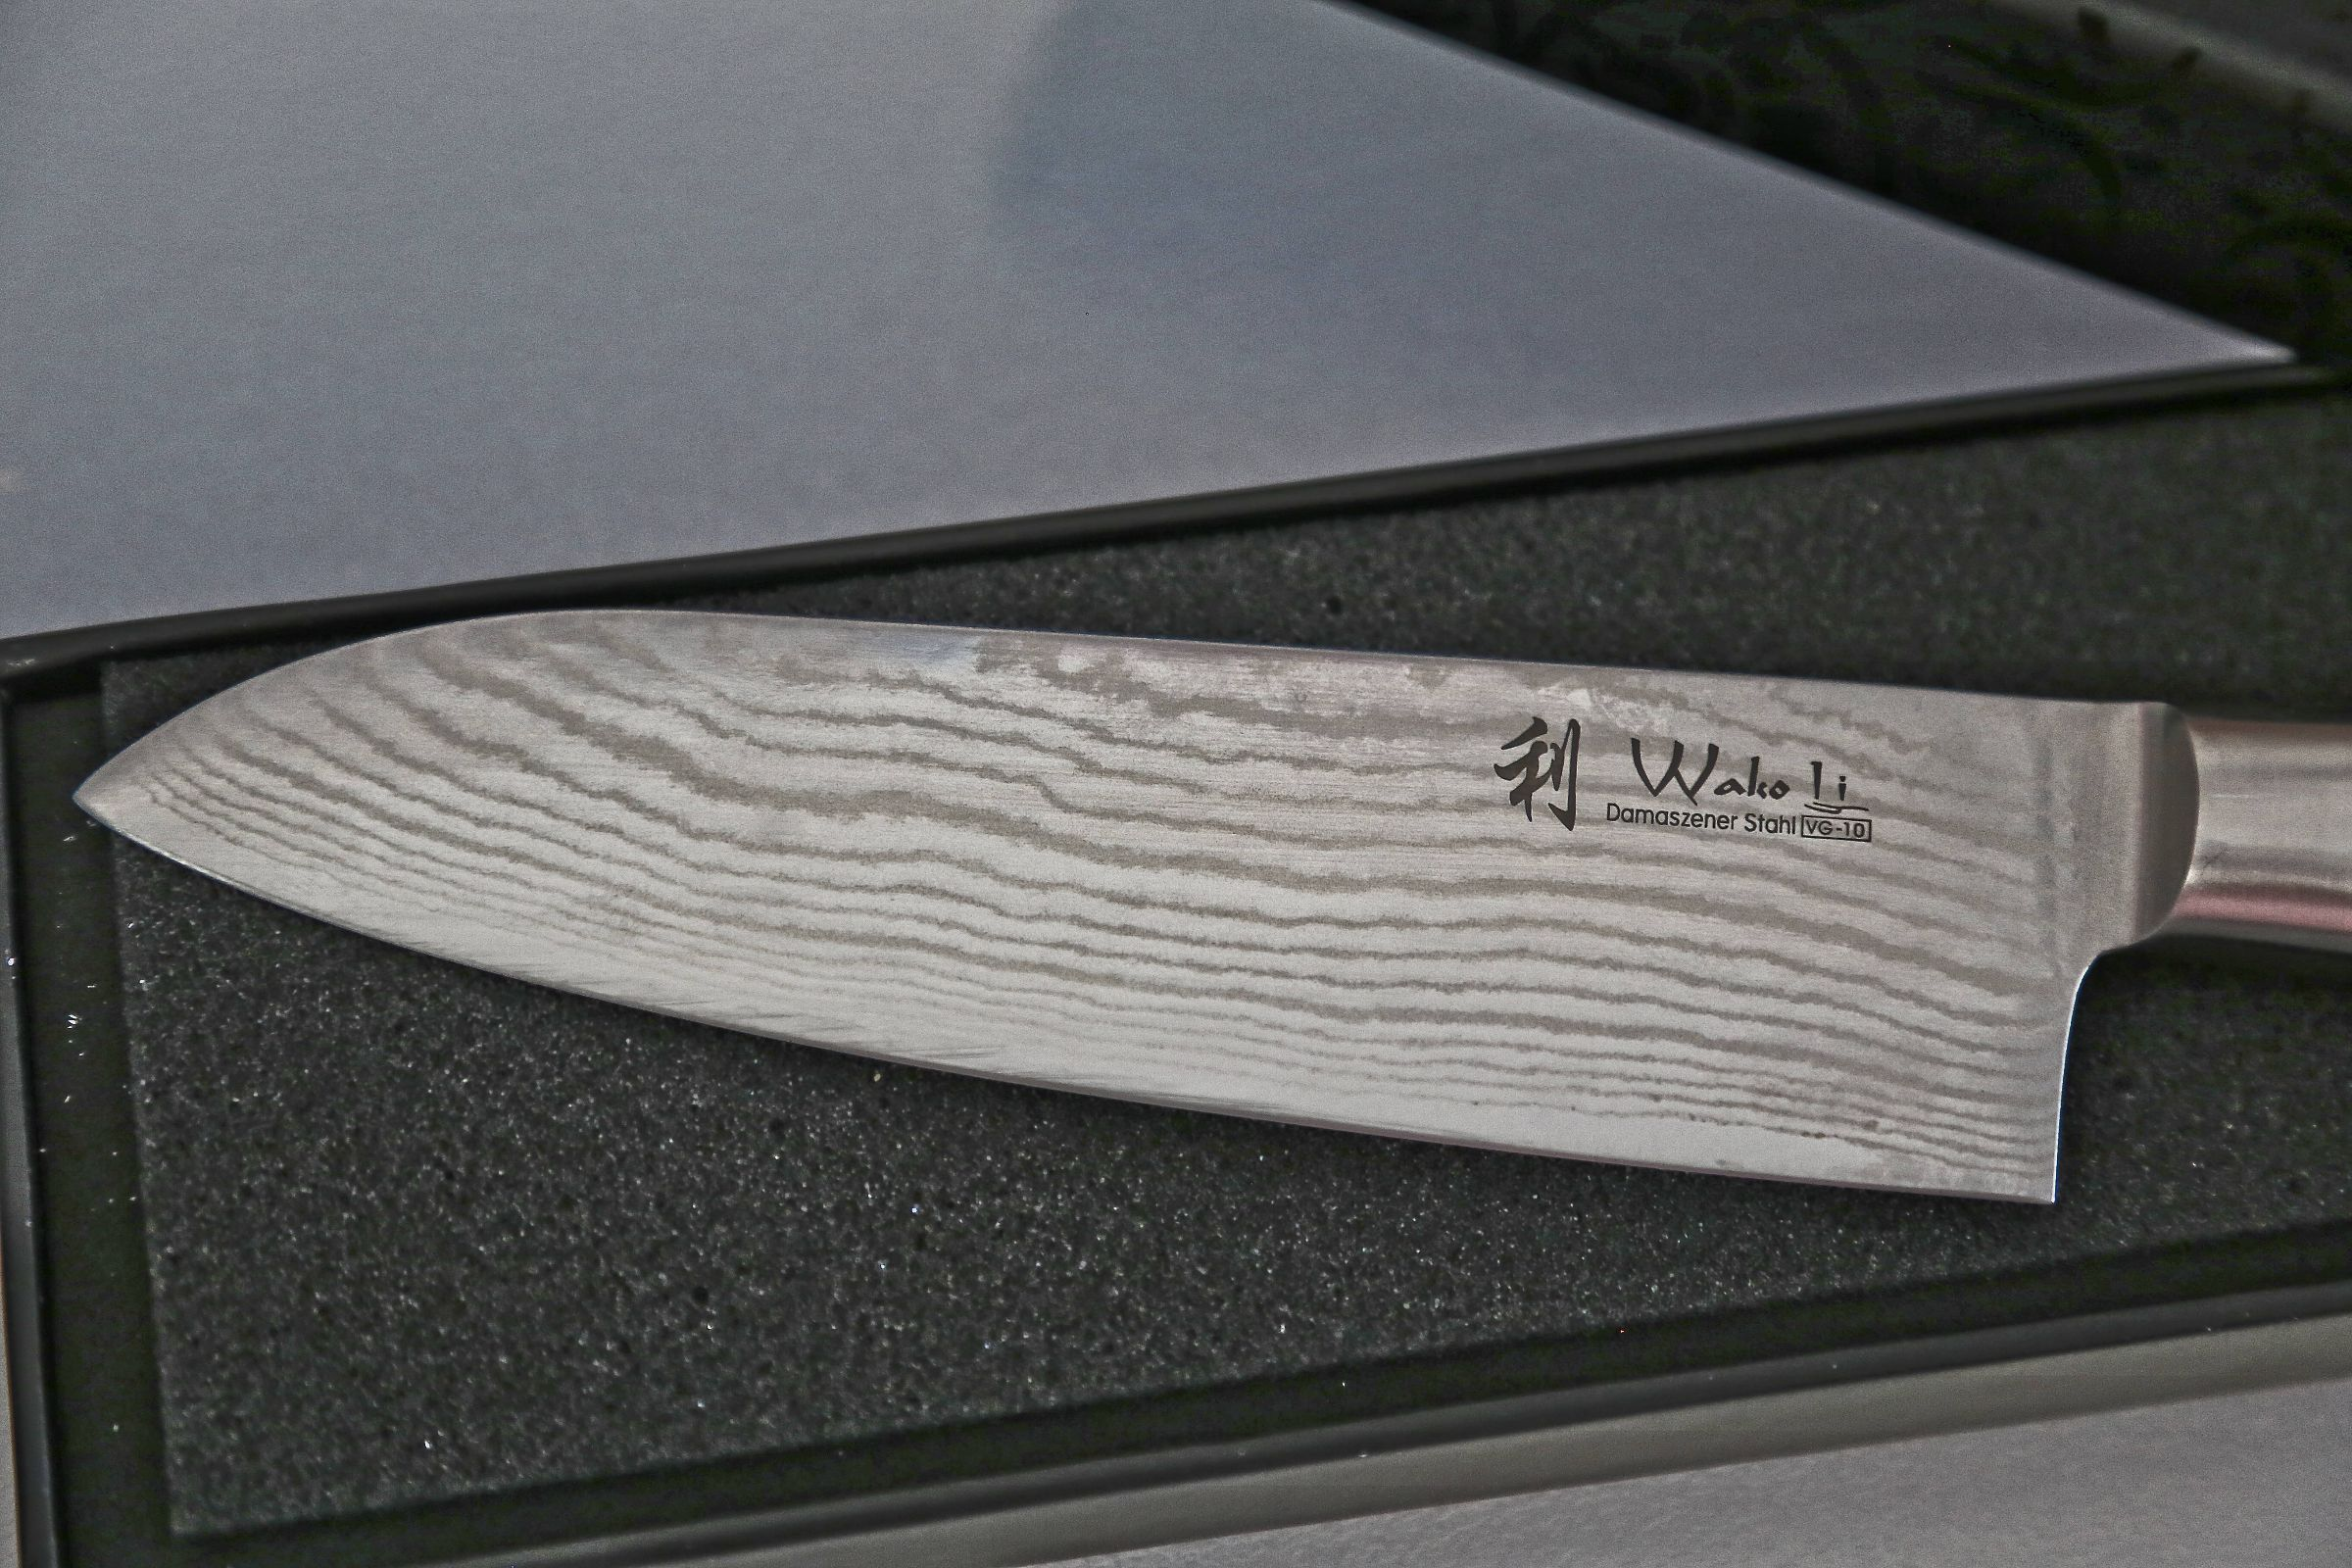 Wakoli 1DM SAN MIK Santoku Damascus Knife Japanese